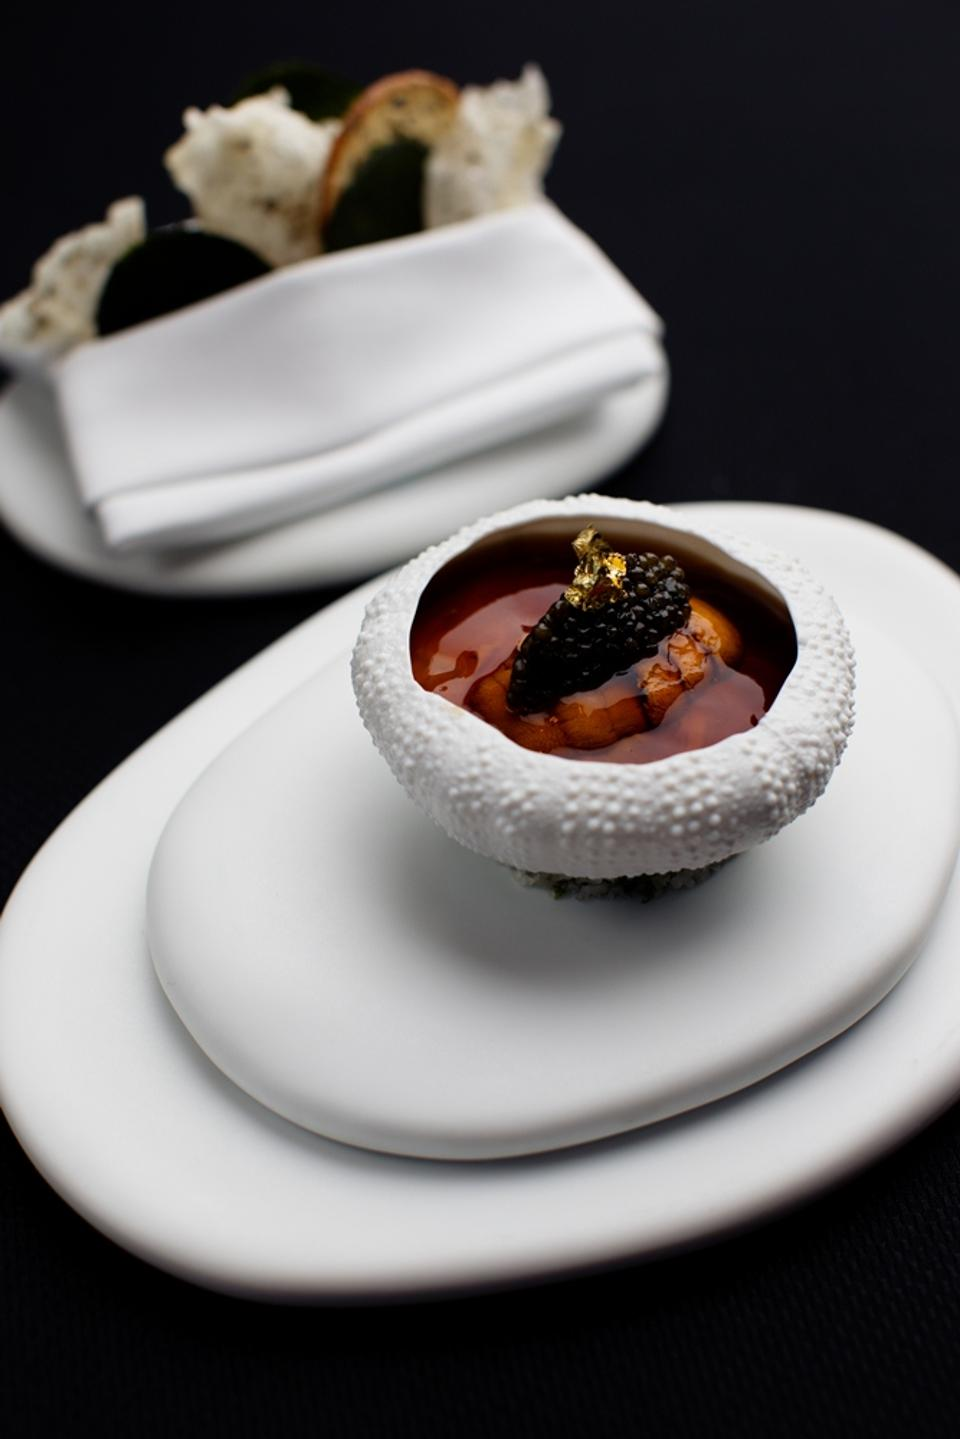 Hokkaido-Sea-Urchin-in-a-Lobster-Jell-O-with-Cauliflower-Caviar-and-Crispy-Seaweed-Waffles-Amber-Hong-Kong